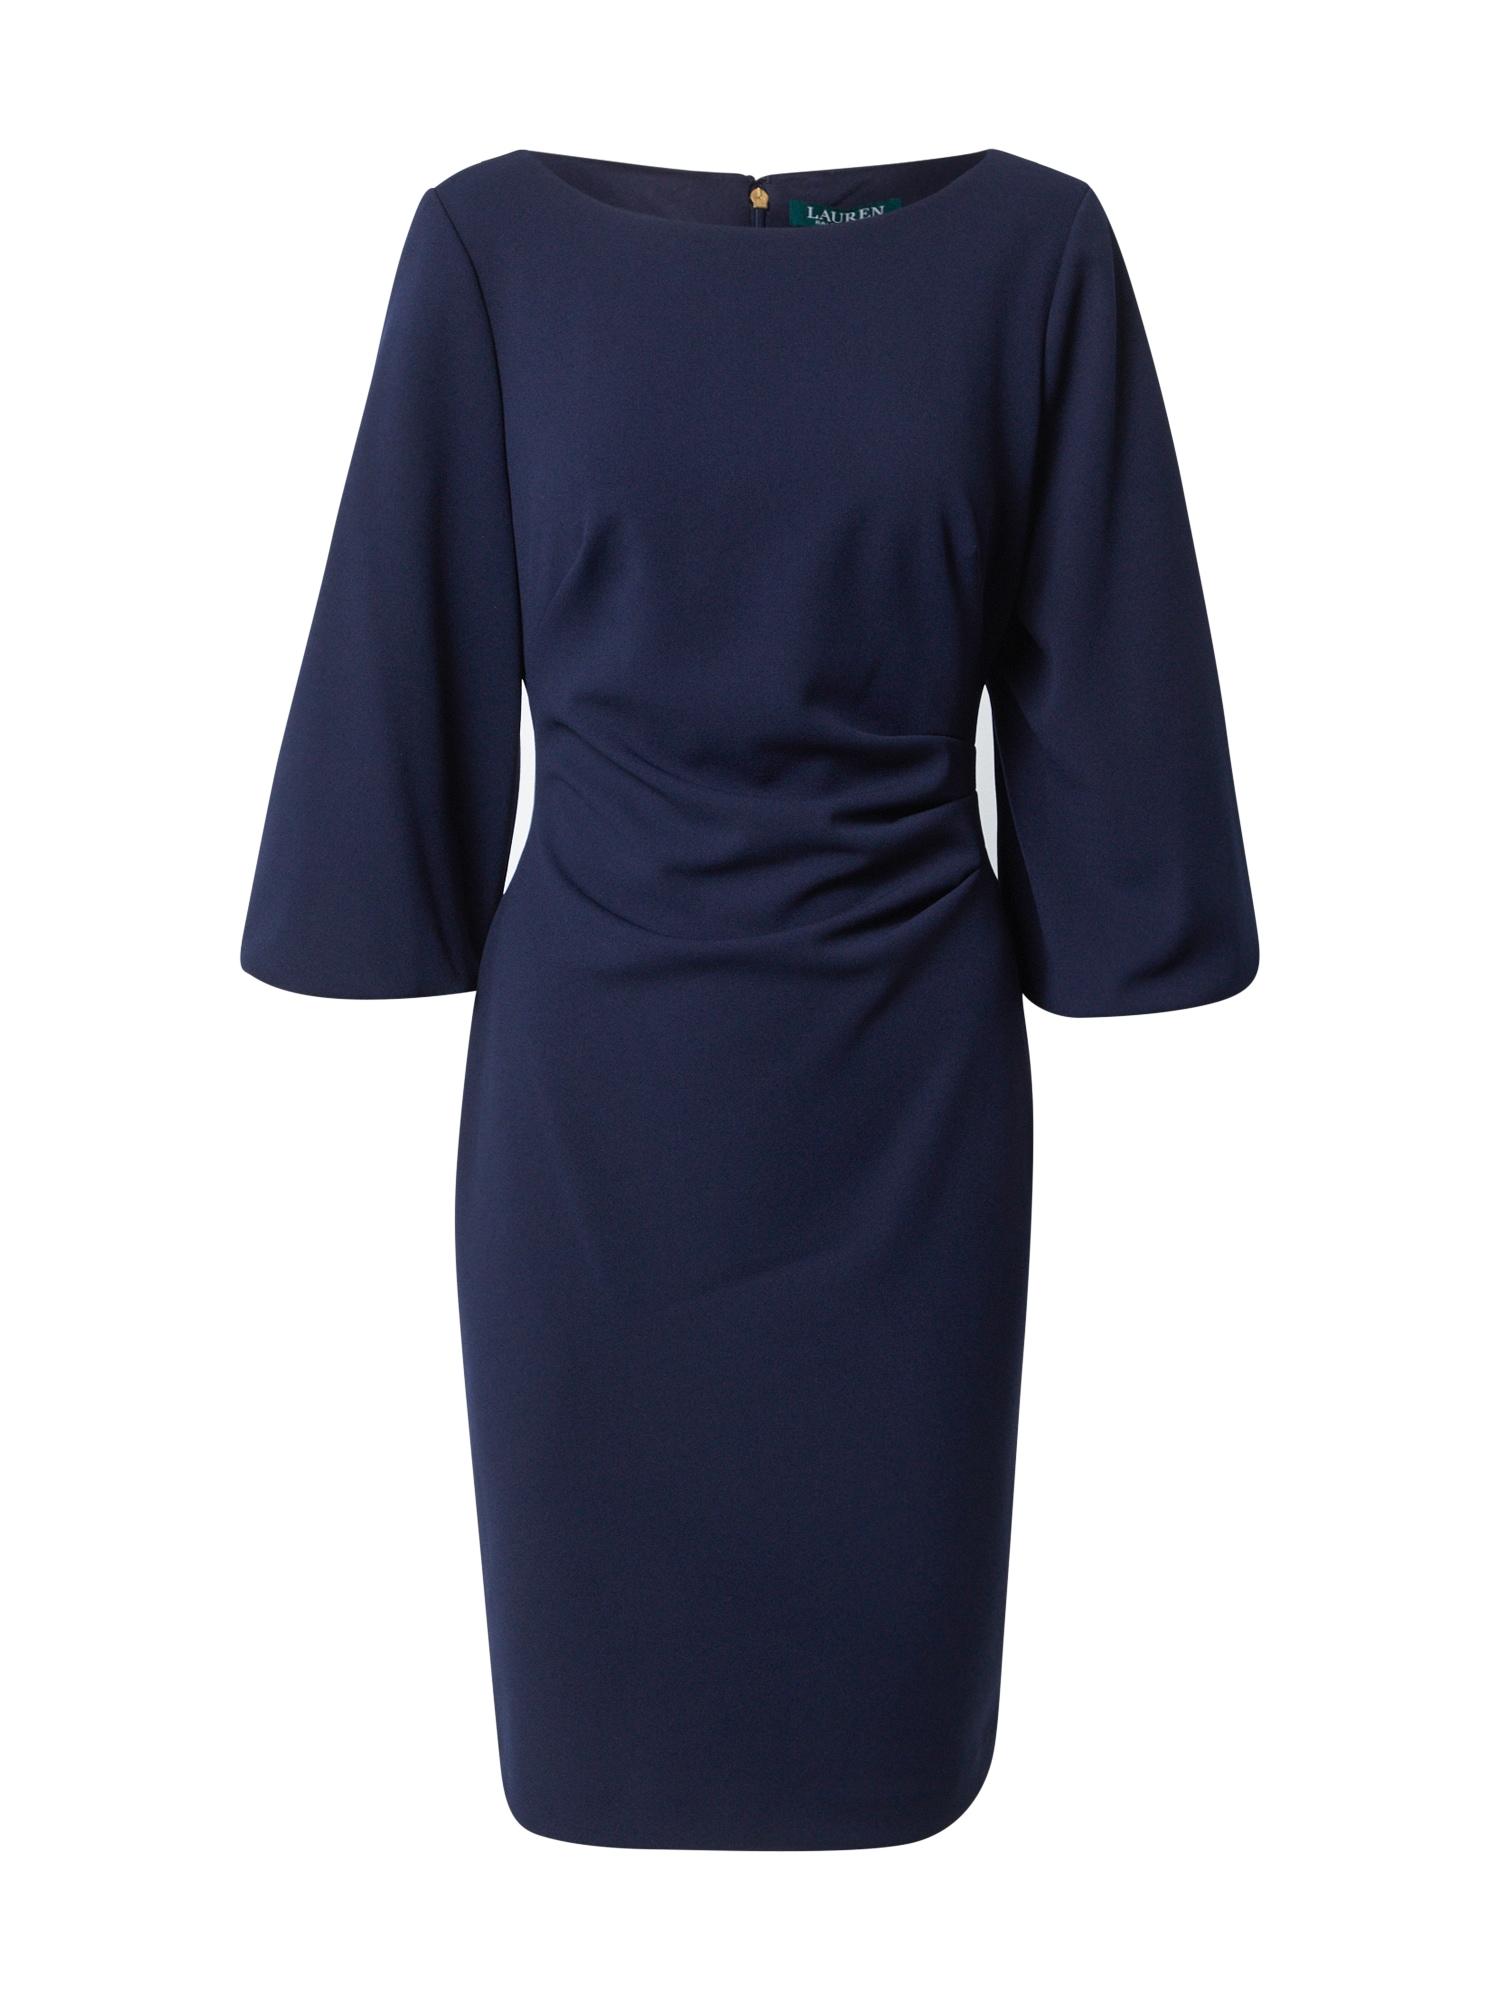 Lauren Ralph Lauren Koktejlové šaty 'LOUISA'  námořnická modř